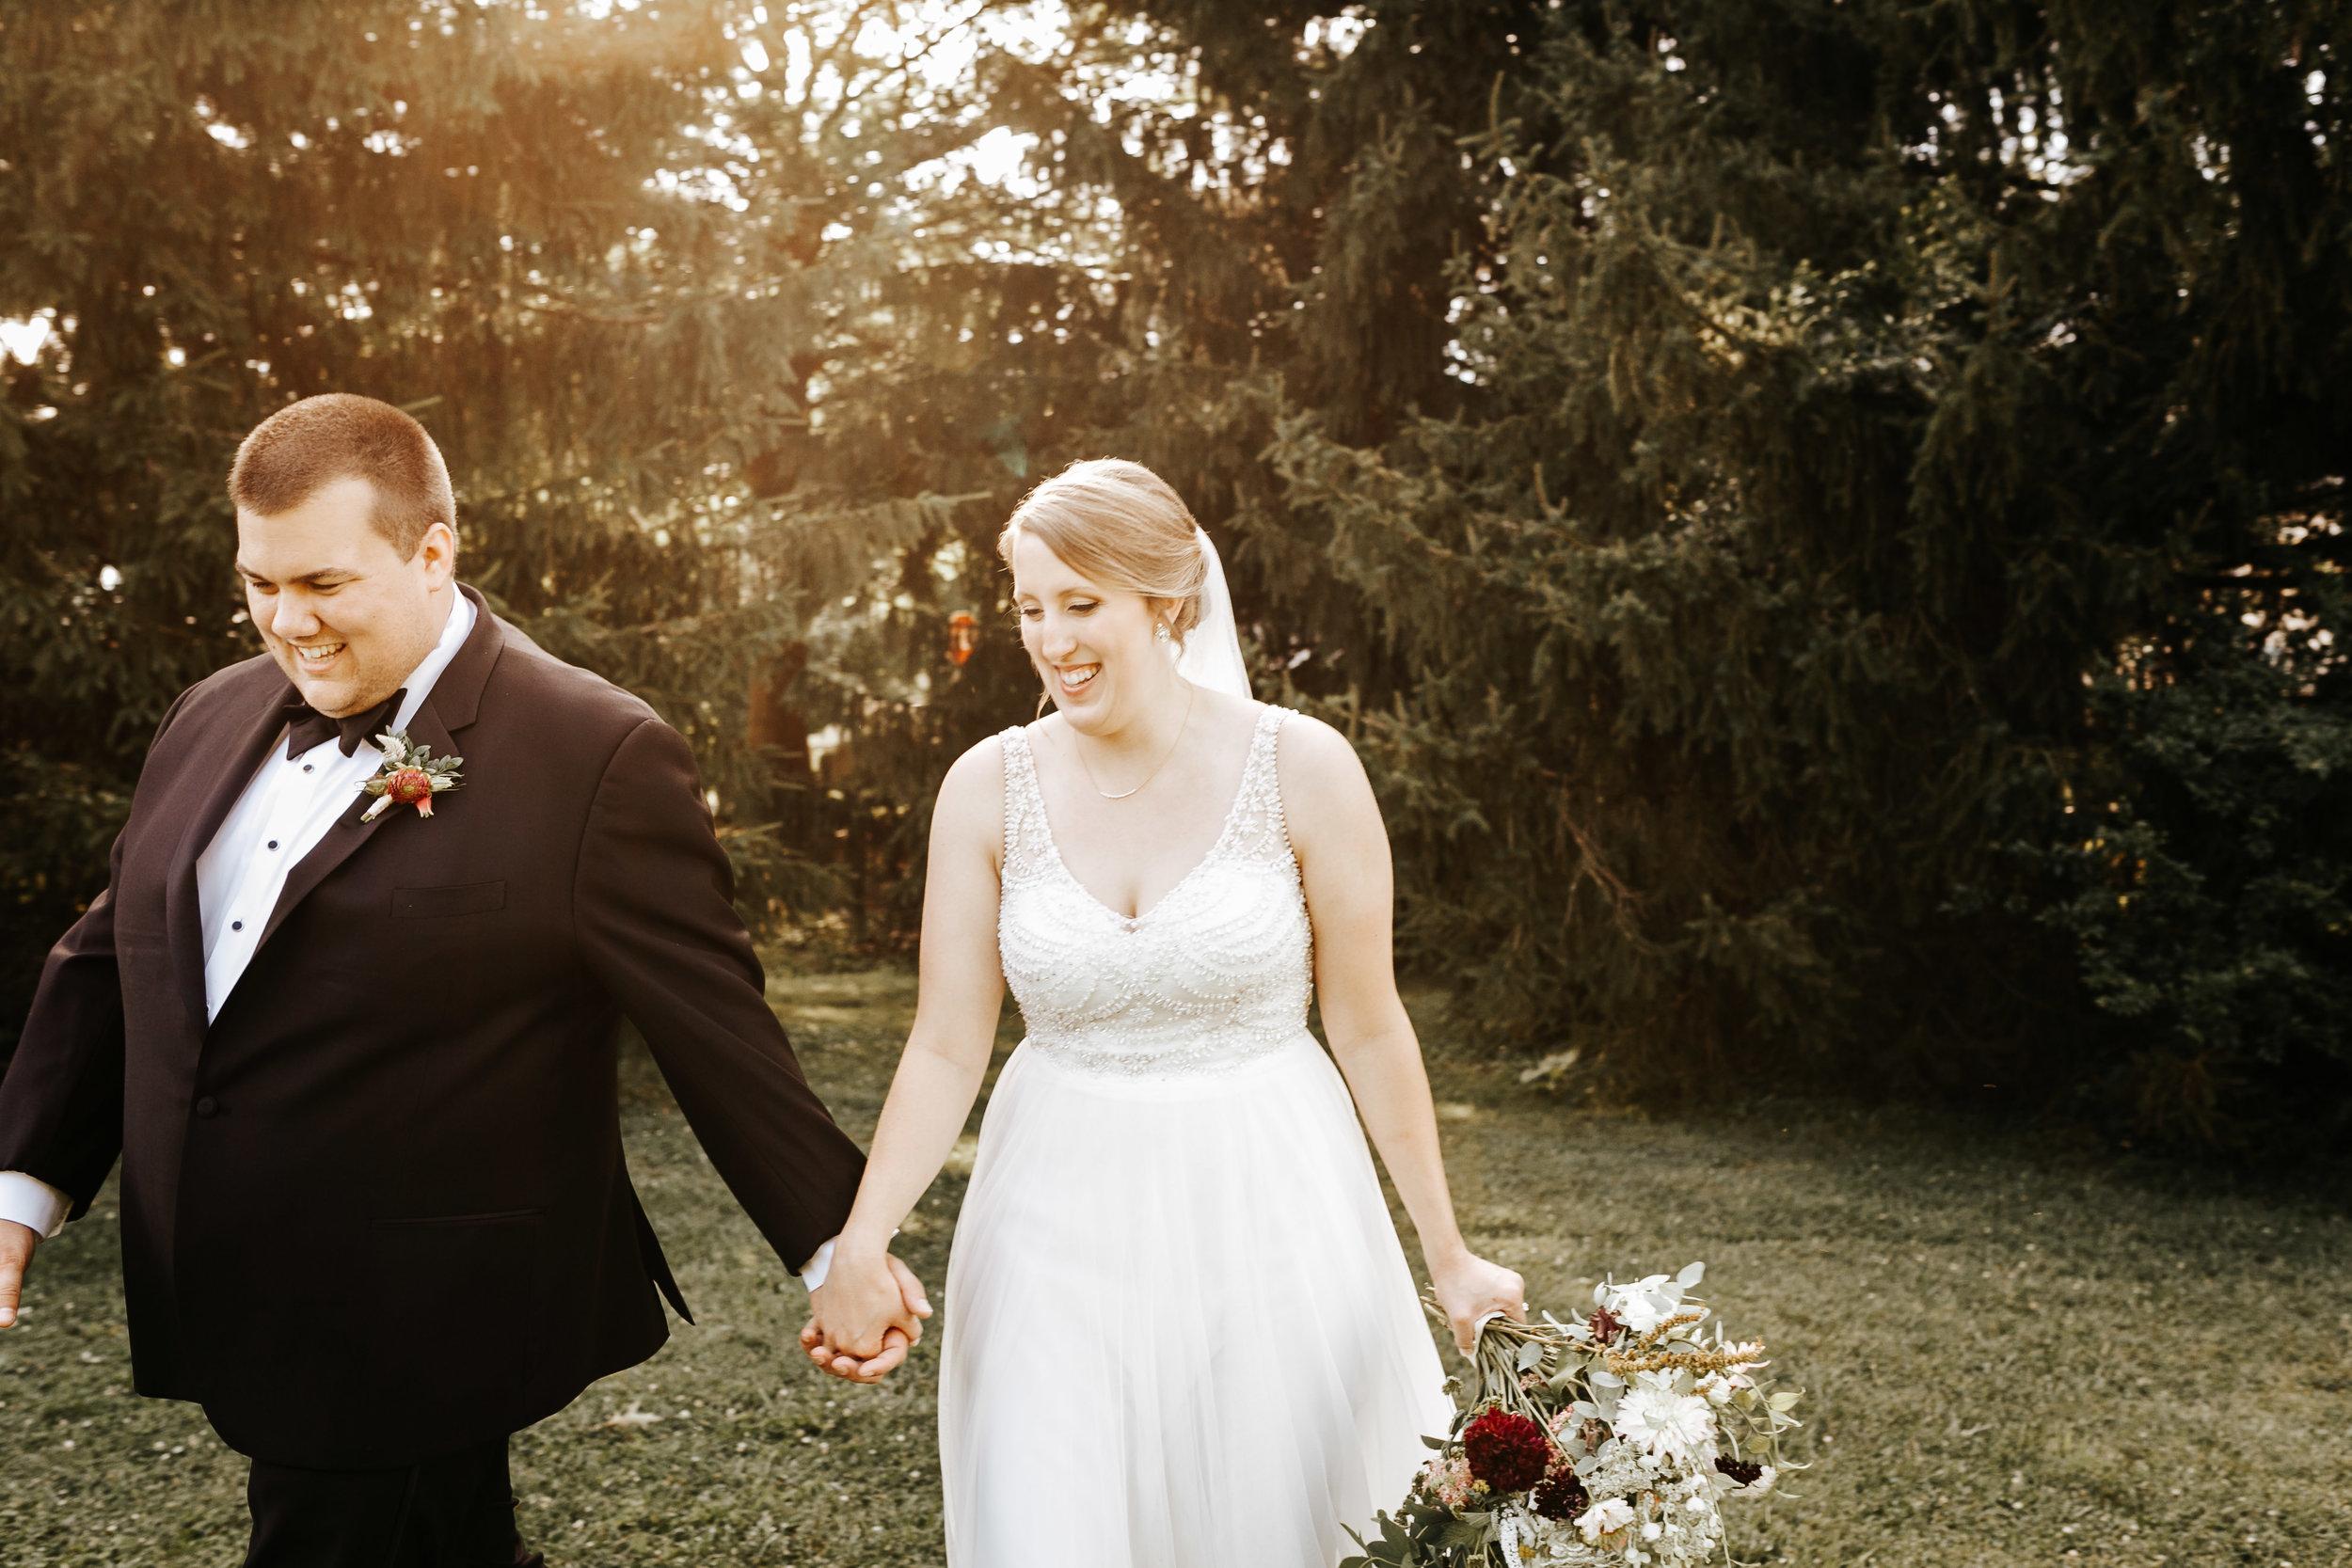 bohemian-photographer-wedding-tennessee-46.jpg